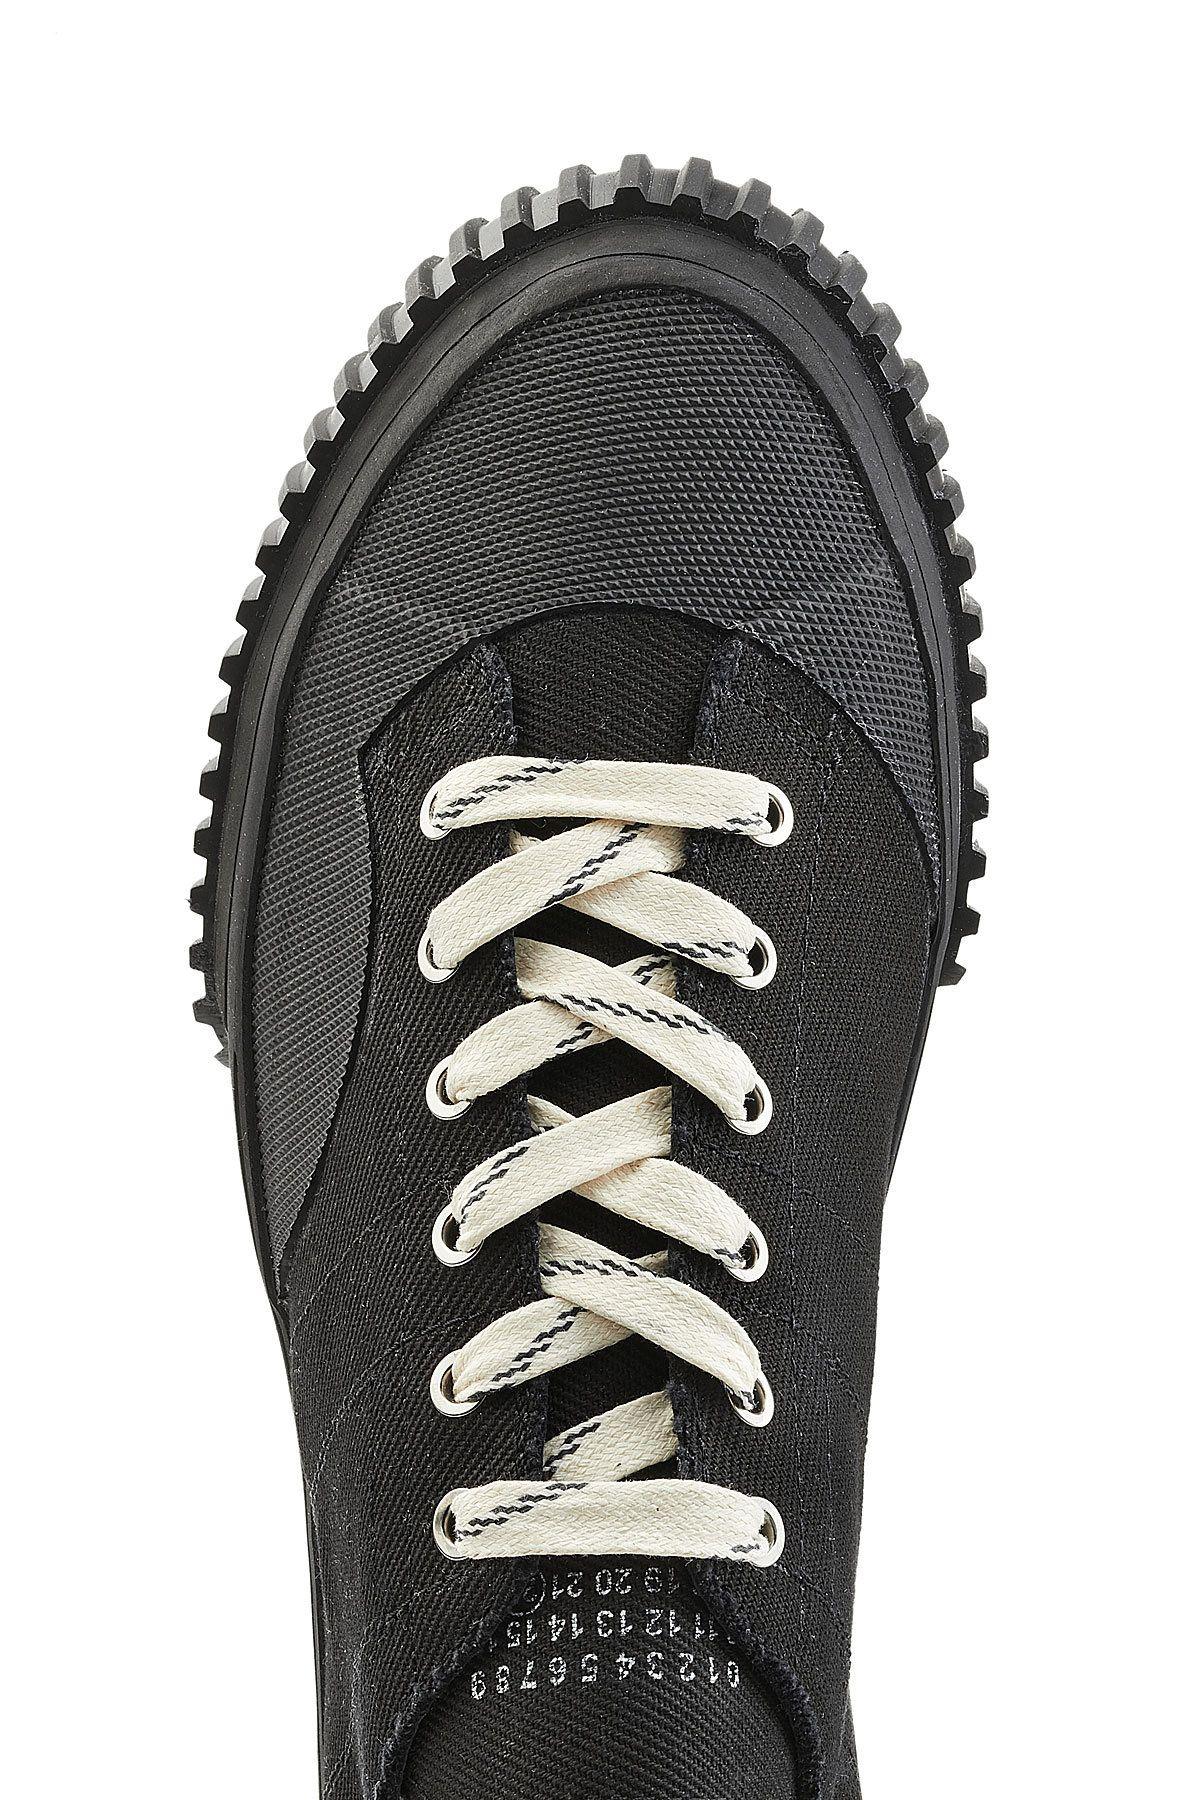 Pin Footwear by KaVan on Zapatos Pinterest Footwear Pin Moda and Detail 35178d